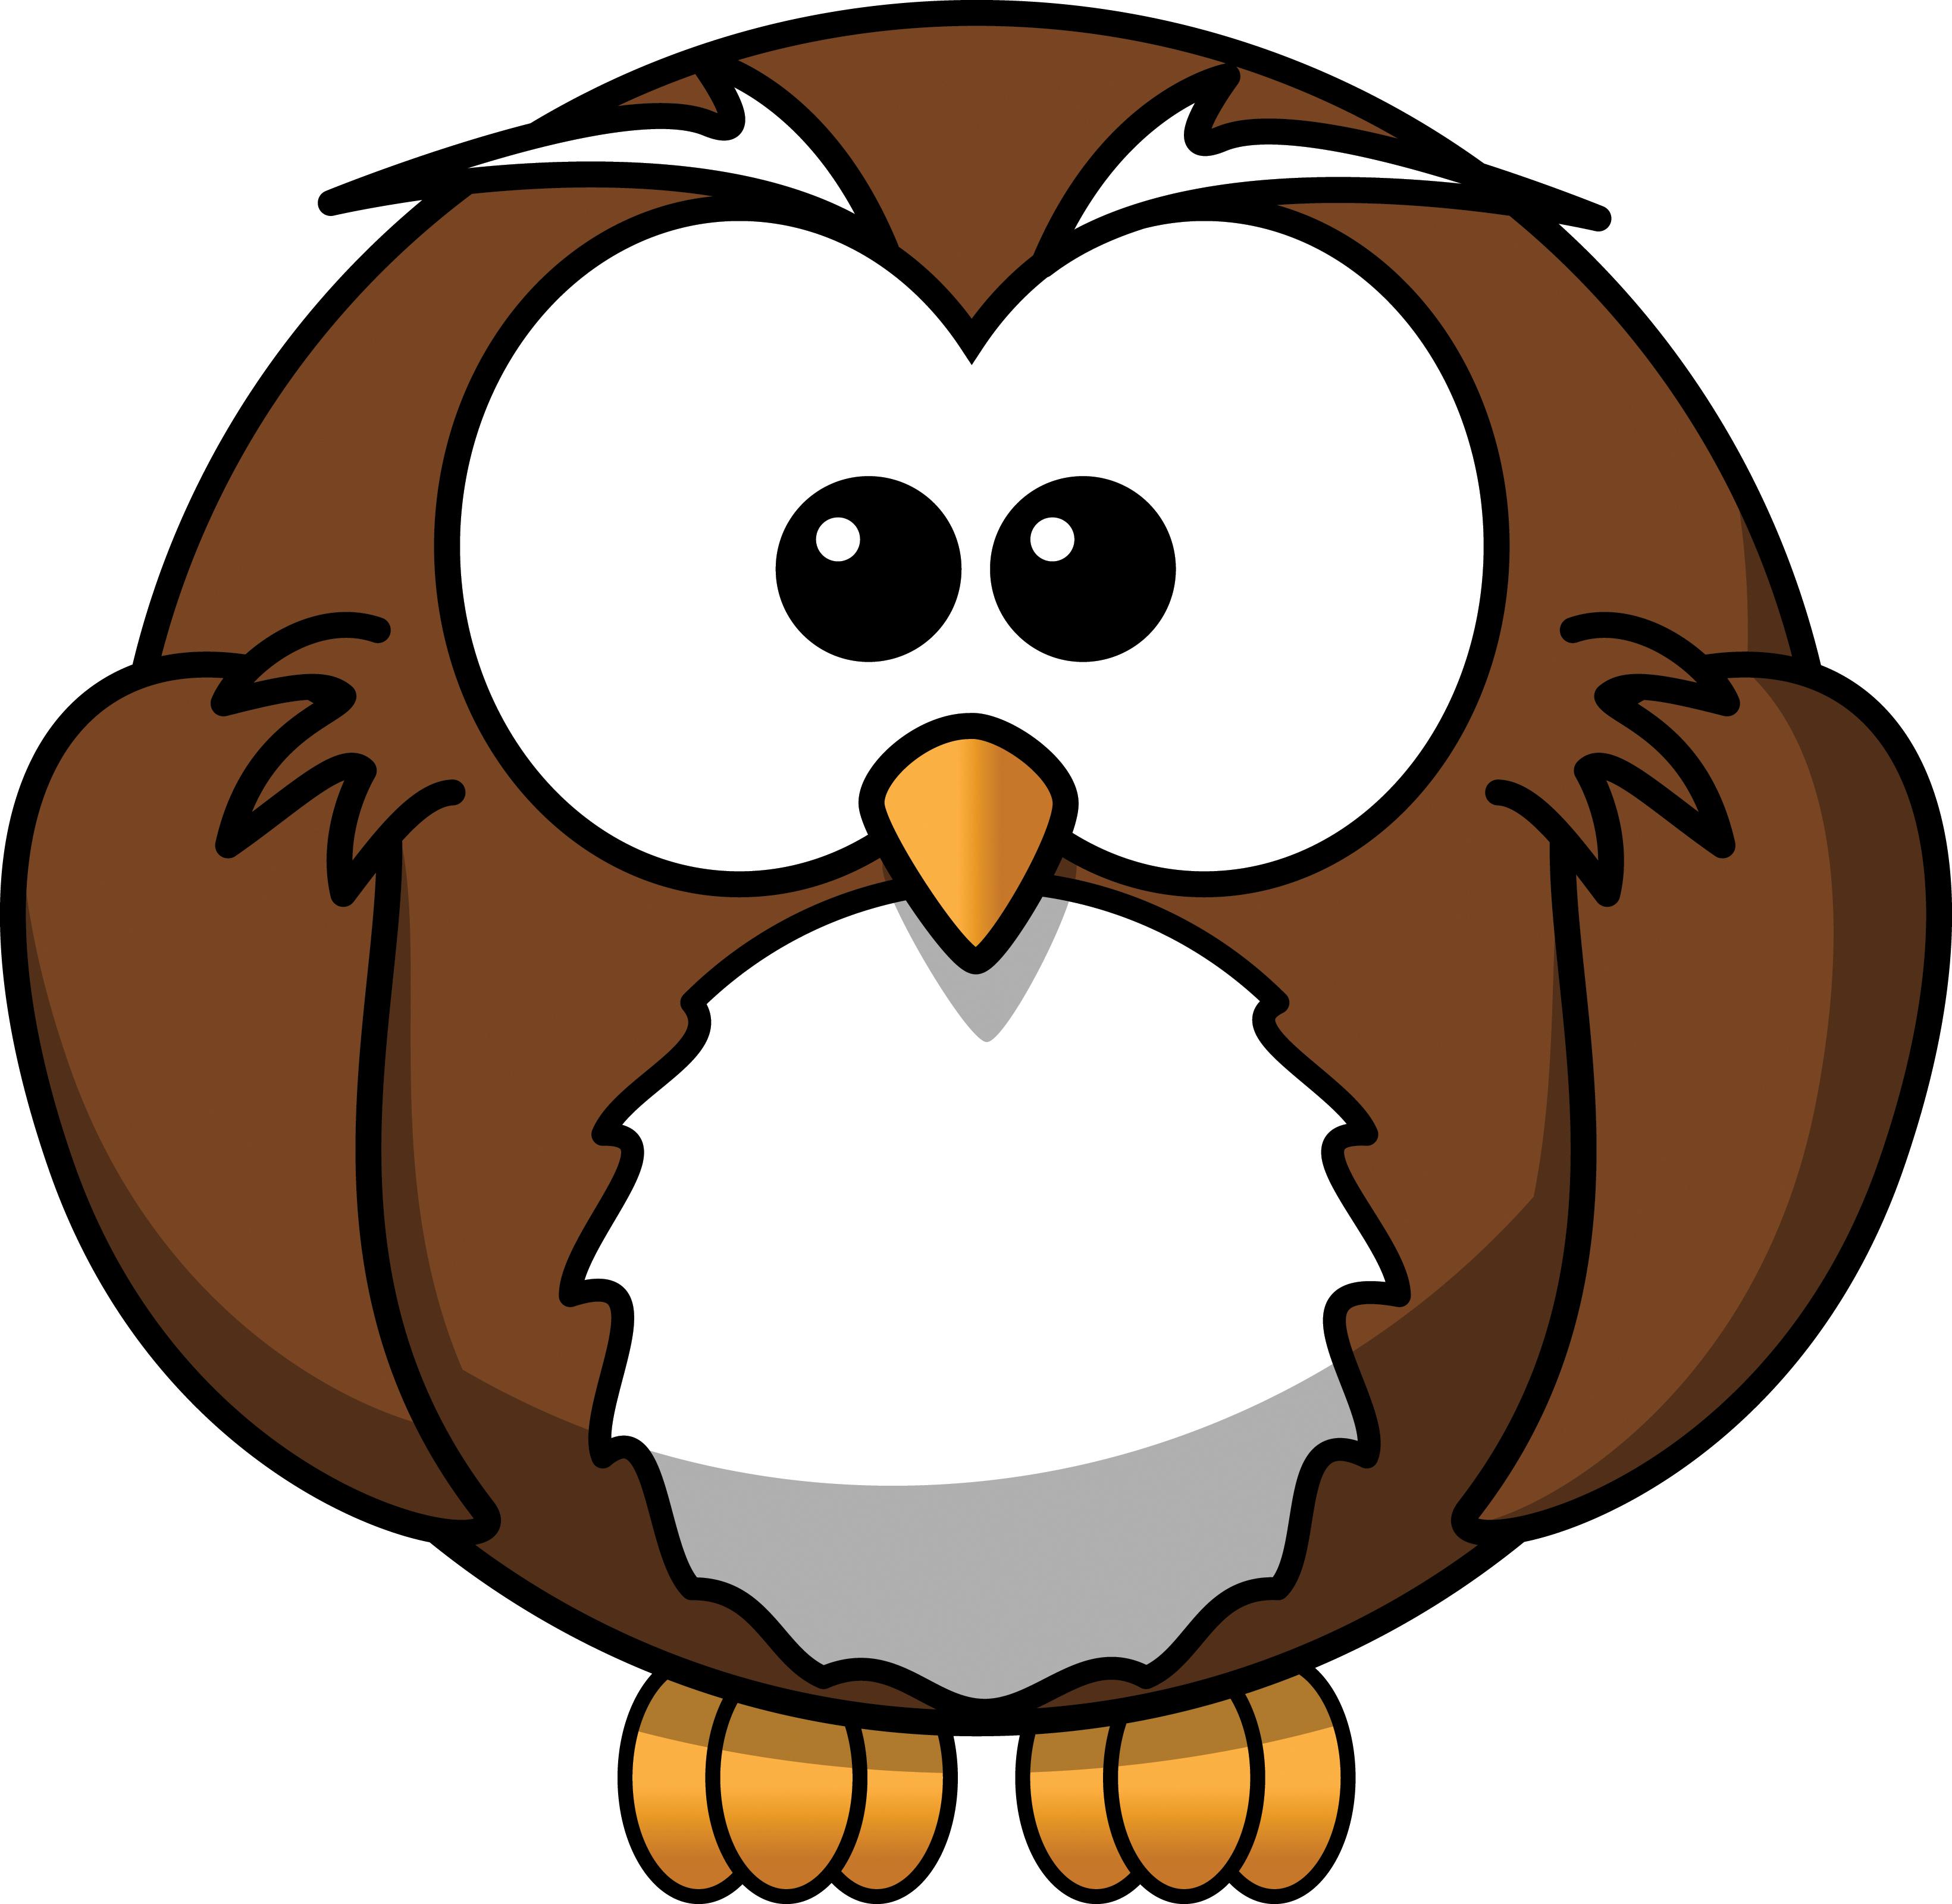 Free Cartoon Owl Clipart-Free Cartoon Owl Clipart-15